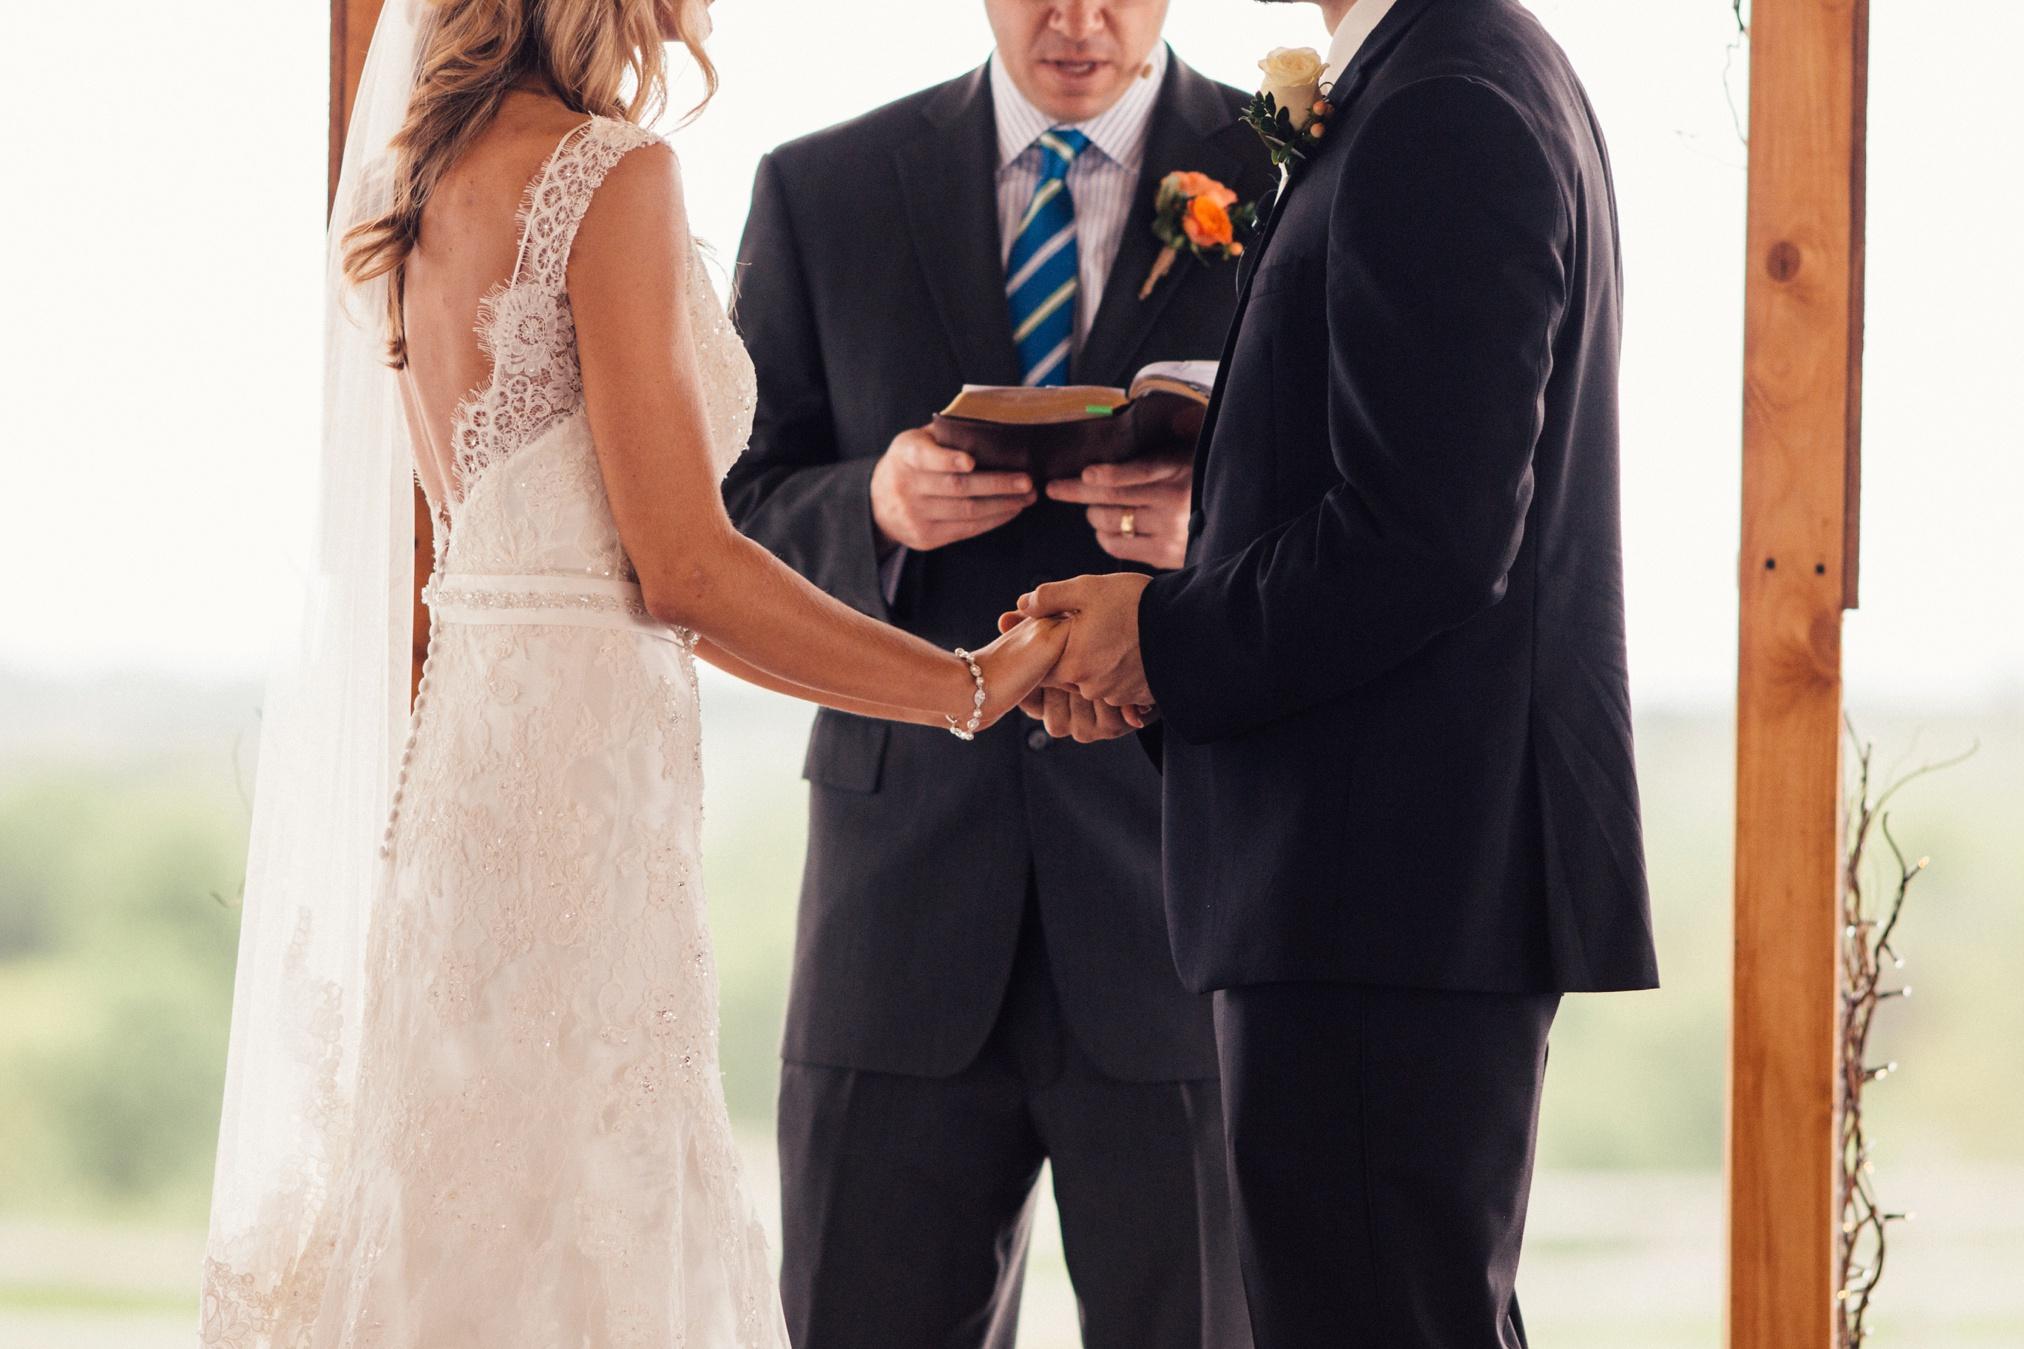 schmid_wedding-539.jpg